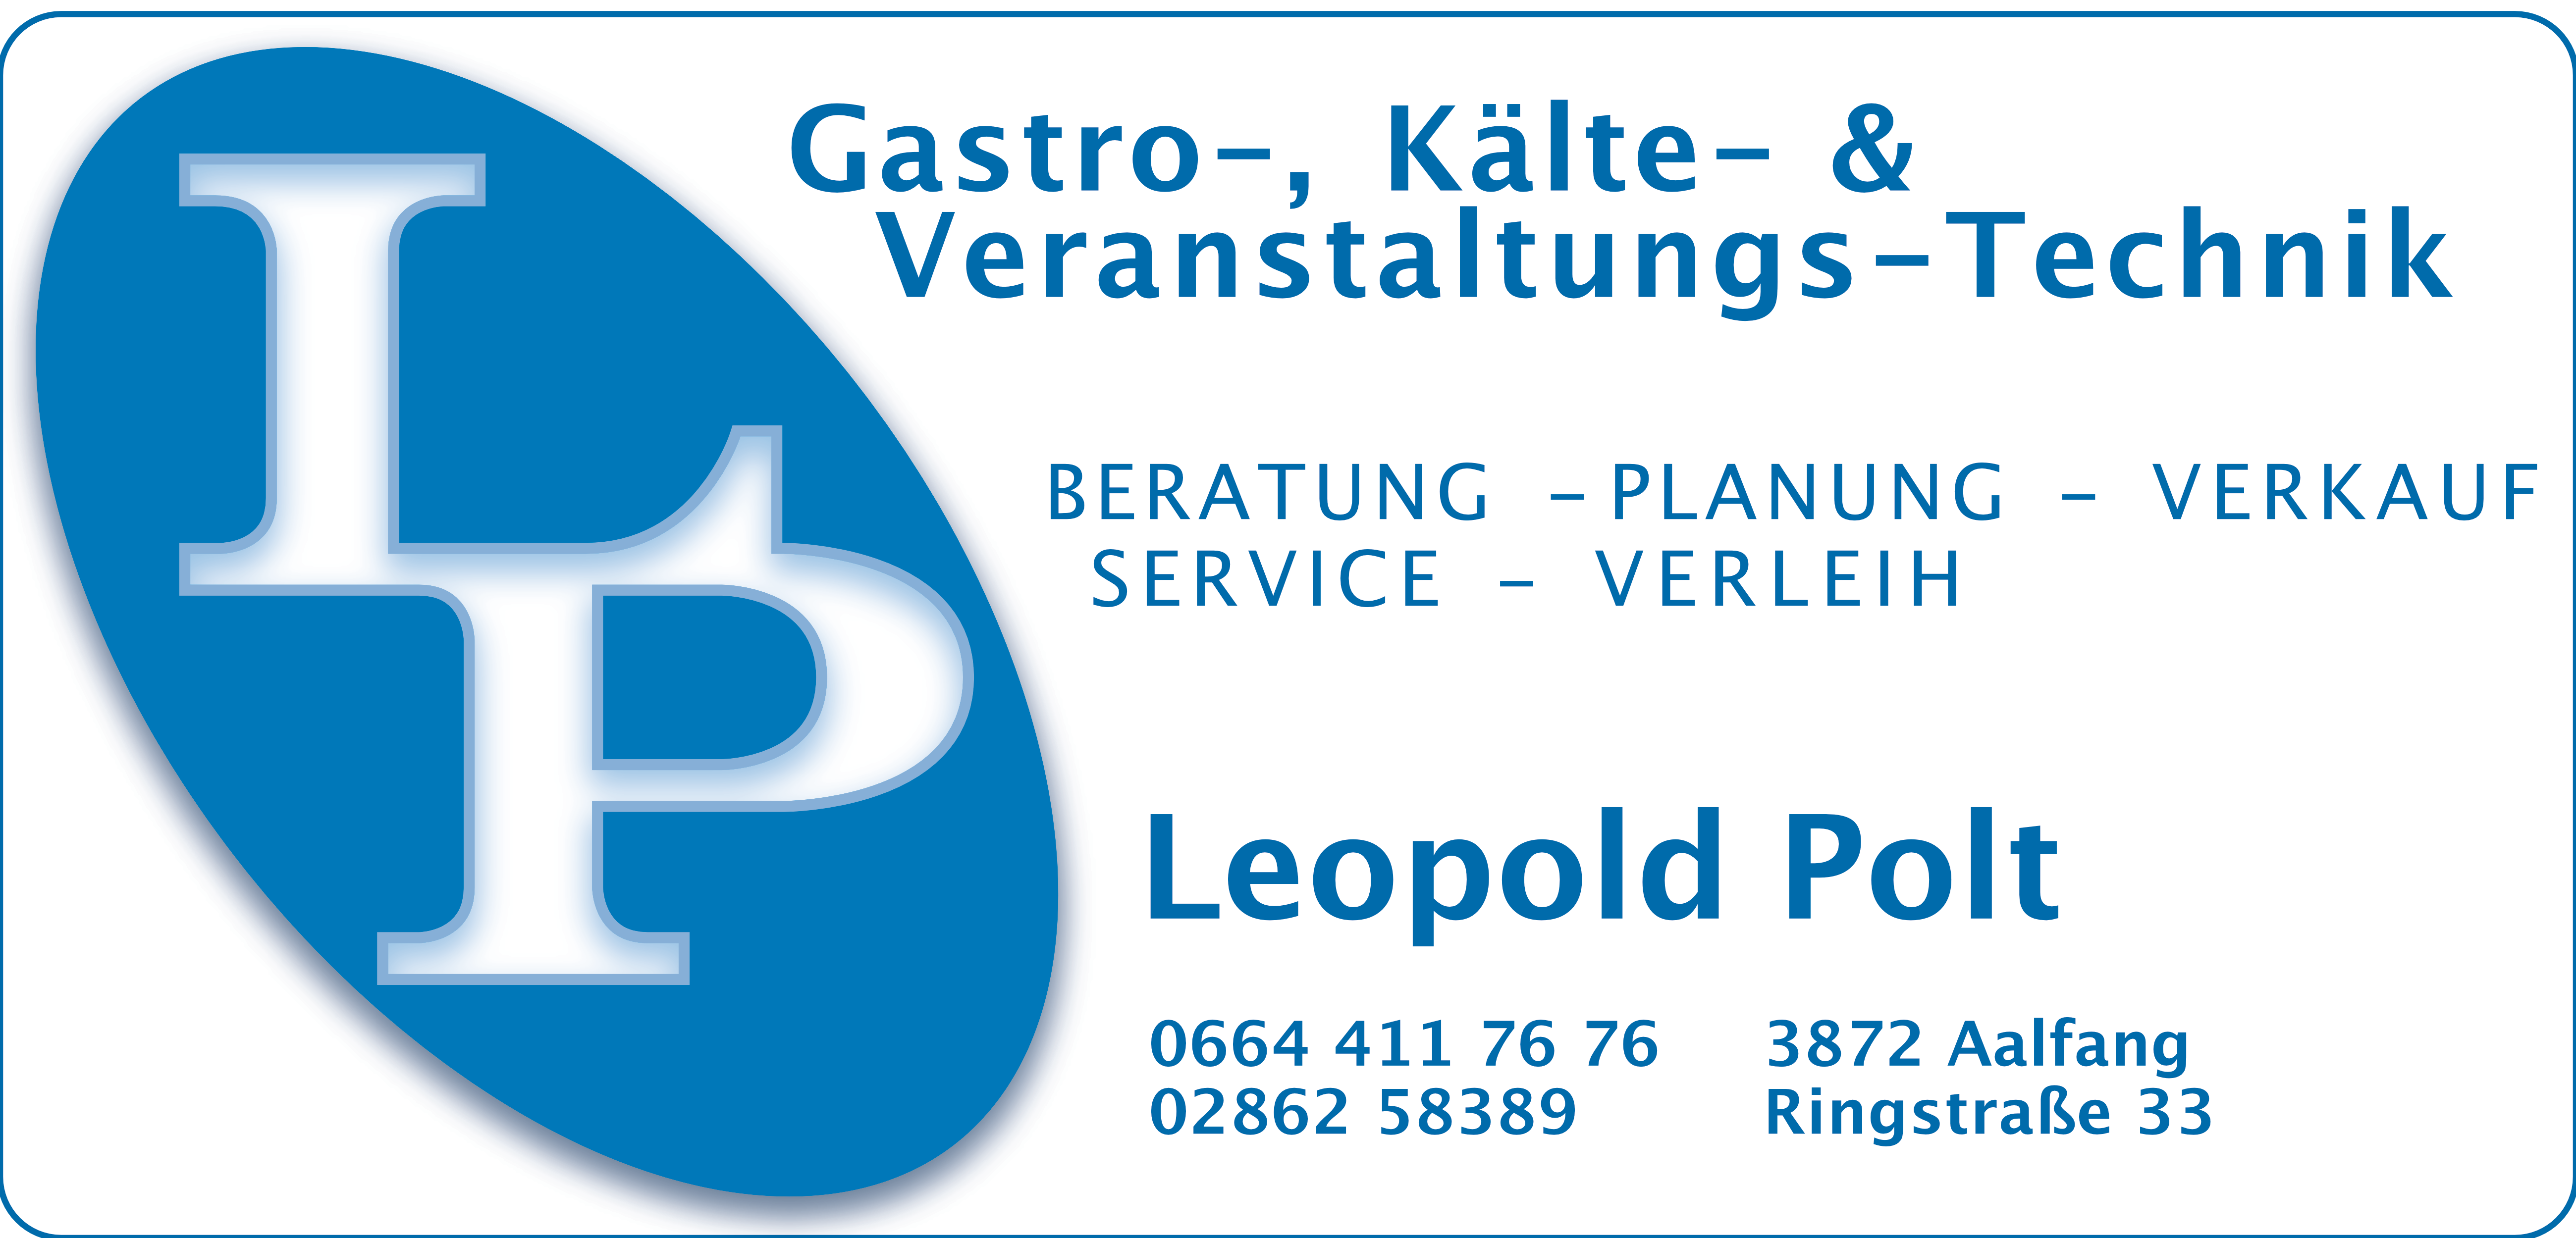 Leopold Polt Gastro-, Kälte- & Veranstaltungs-Technik